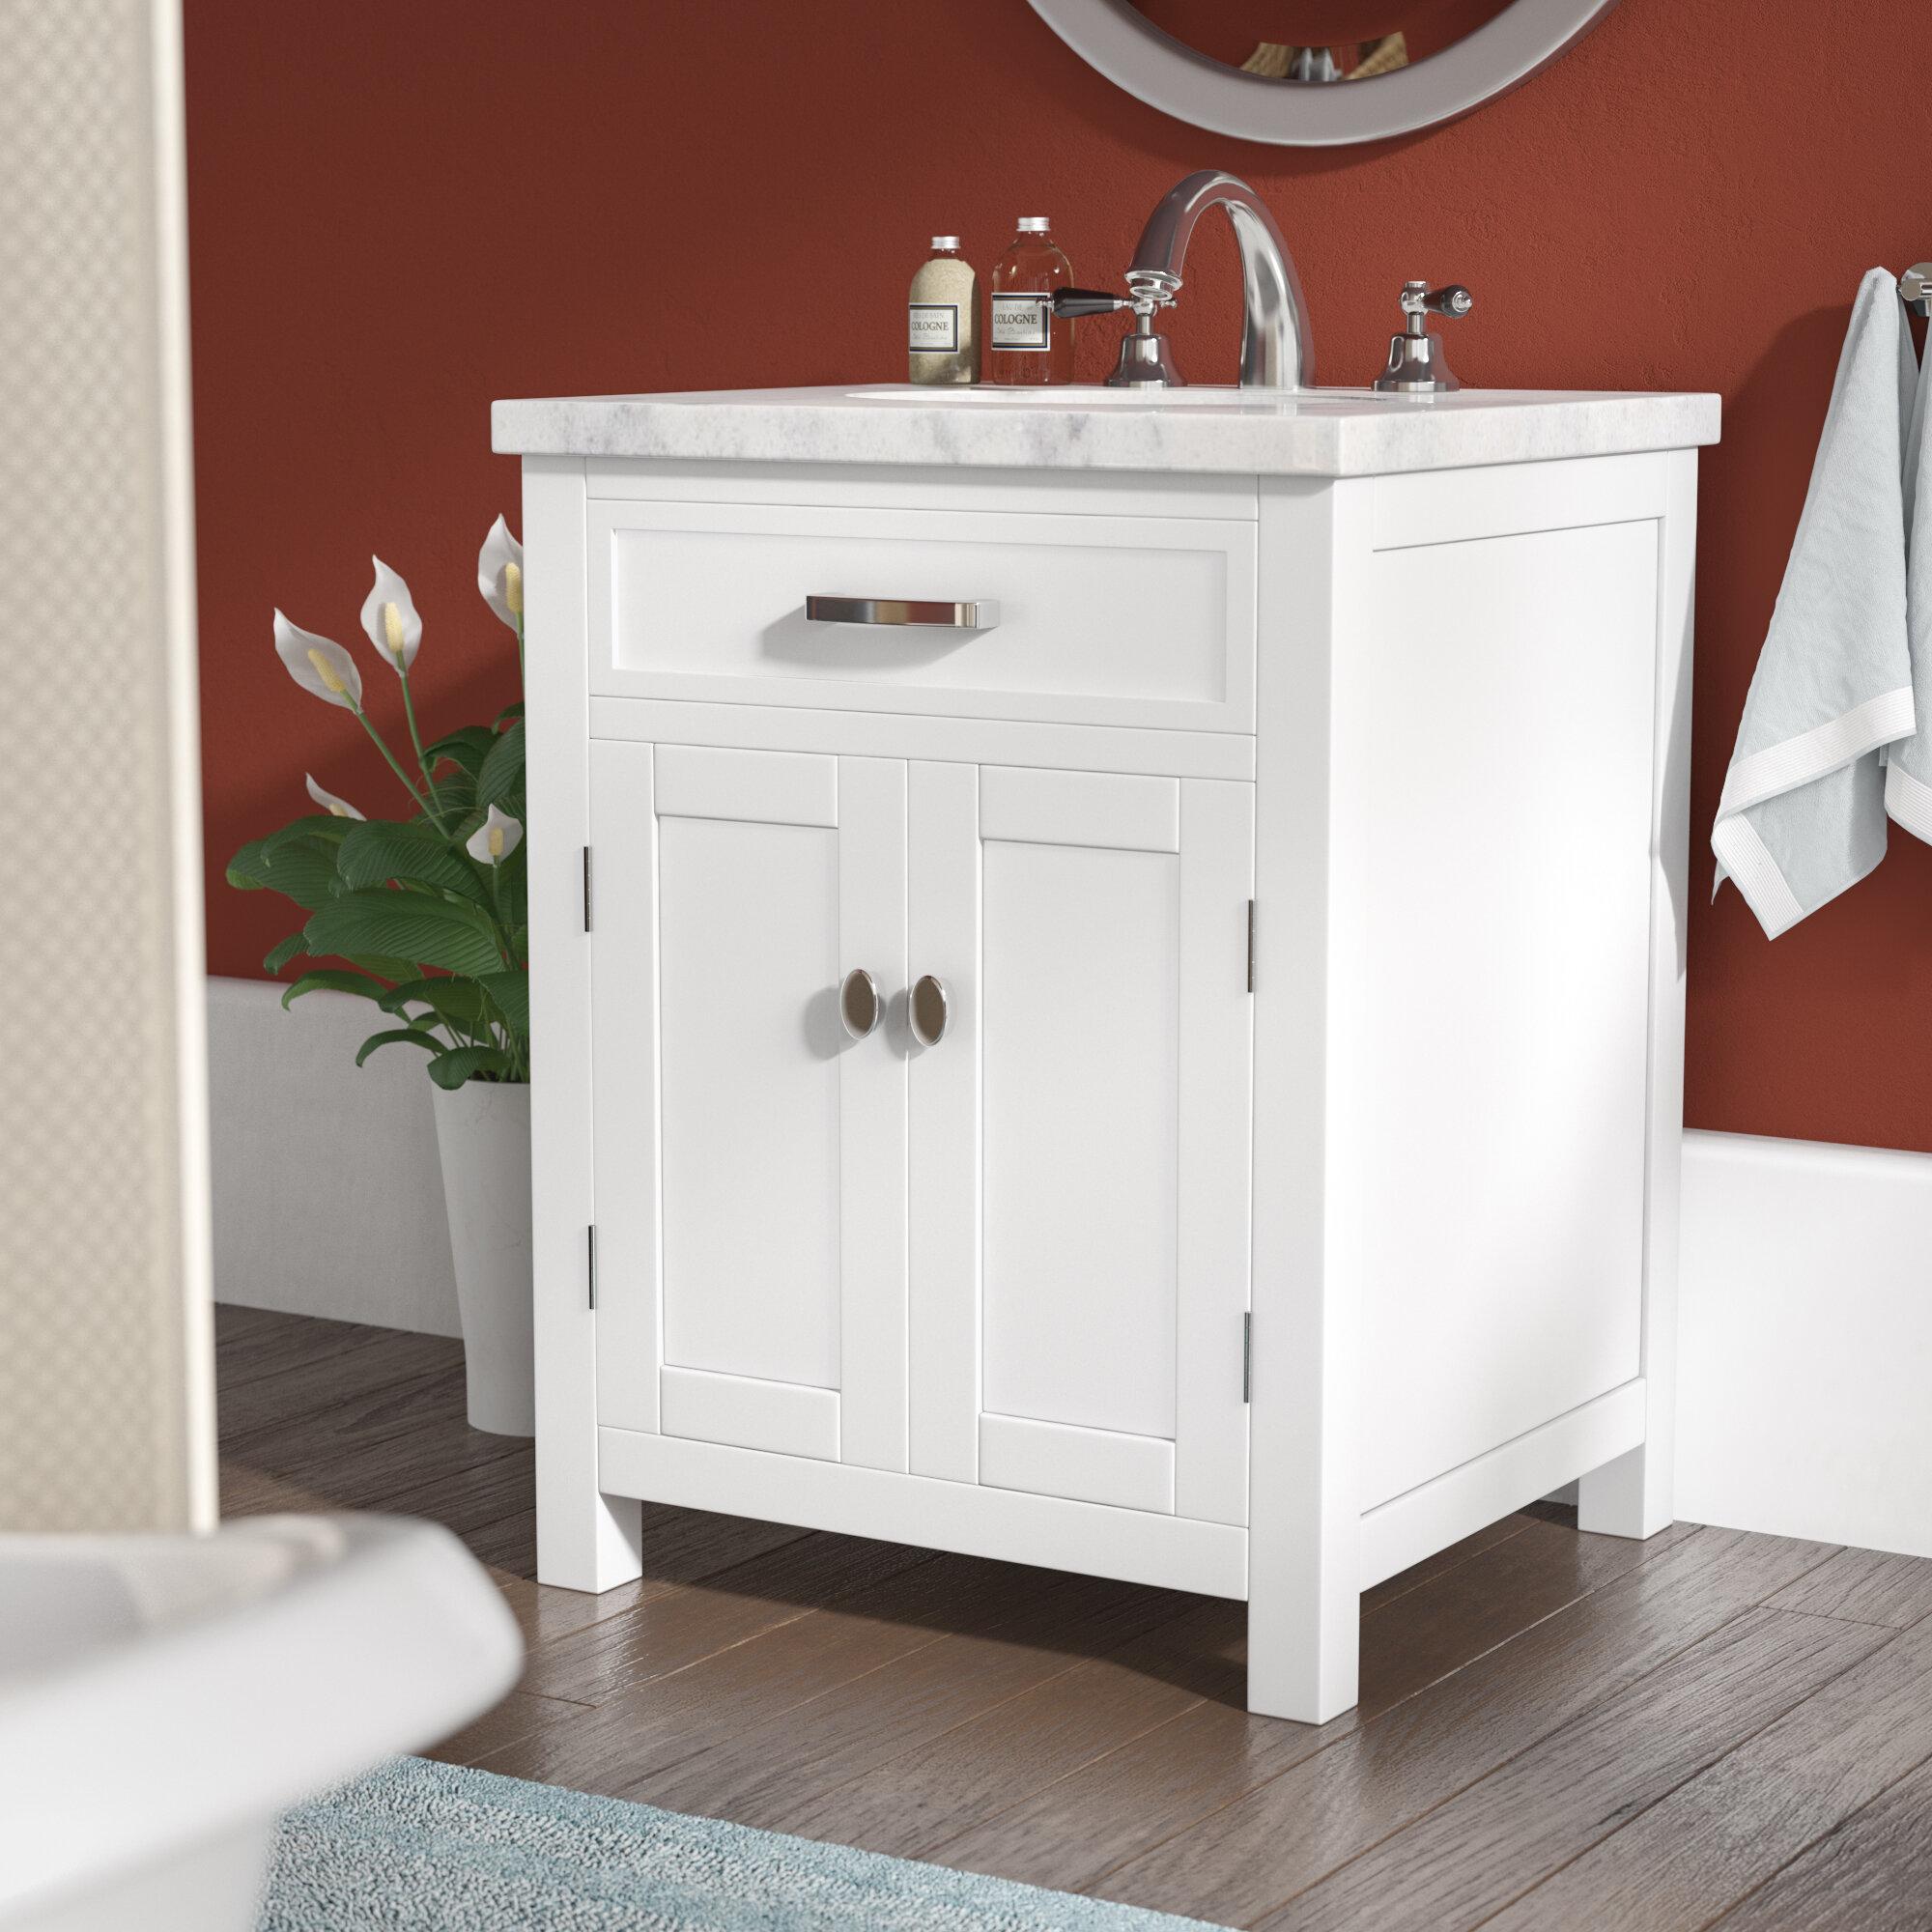 Andover mills latham 24 single bathroom vanity set reviews wayfair